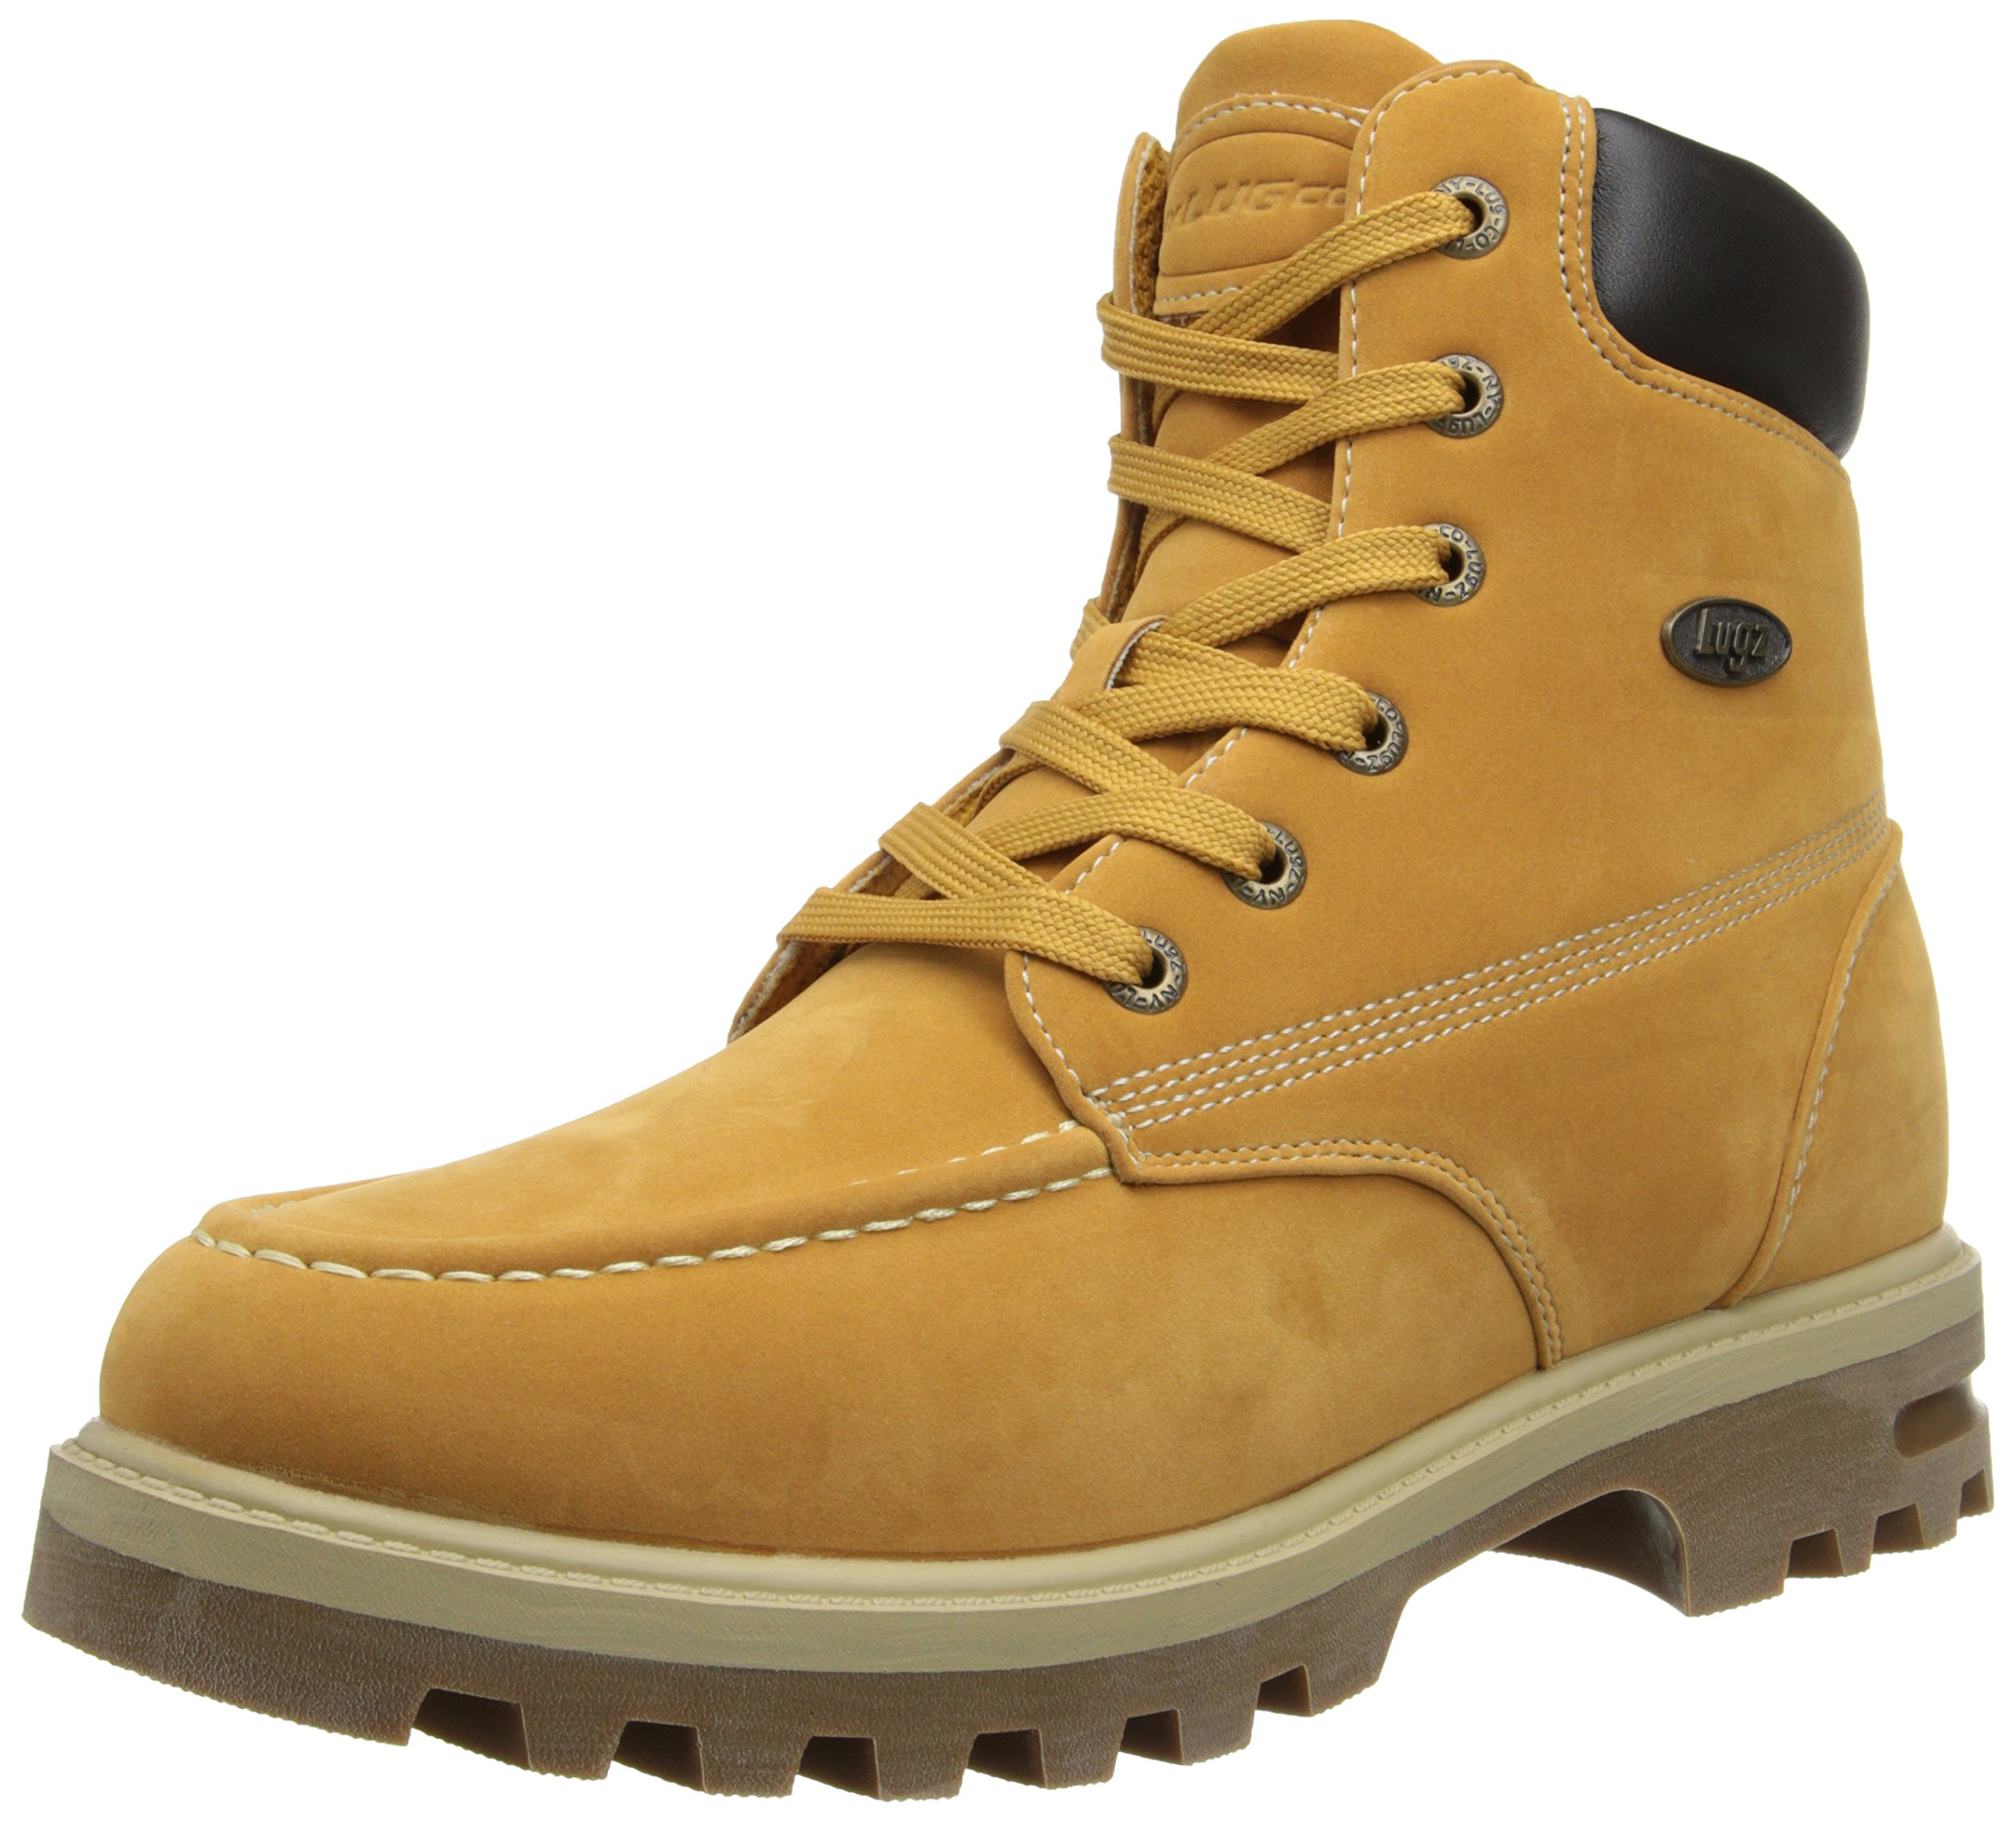 Lugz Men's Howitzer WR Boot, Golden Wheat/Cream/Bark/Gum, 12 D US